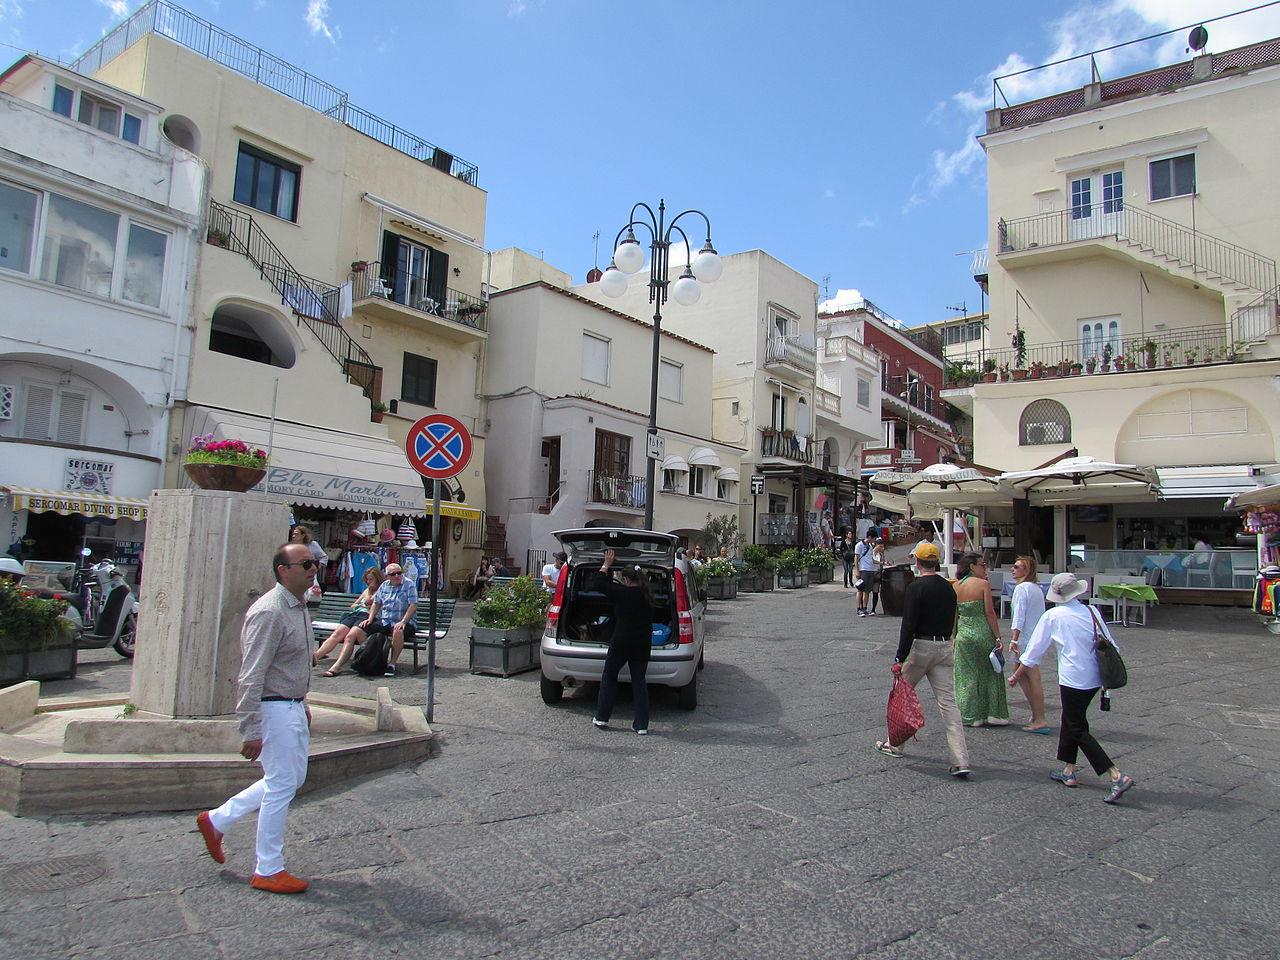 Улицы Марина-Гранде, Капри